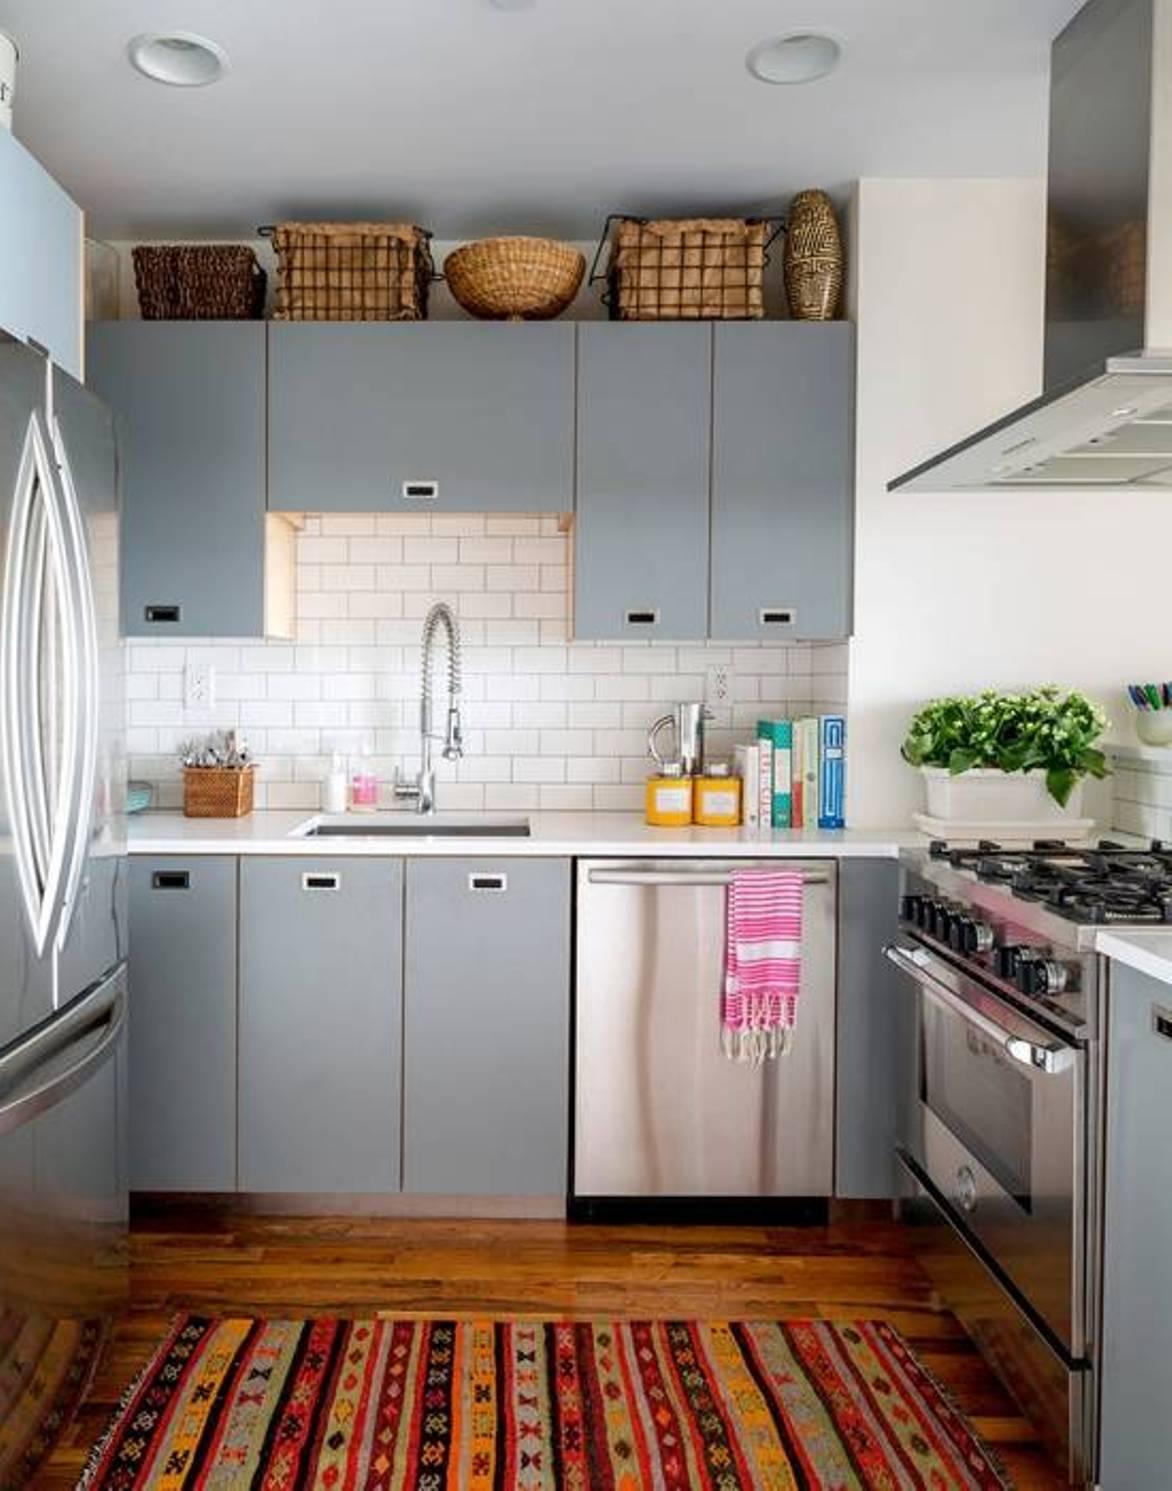 Beautiful Abodes: Small Kitchen - Loads of Character on Small Kitchen Ideas  id=28741